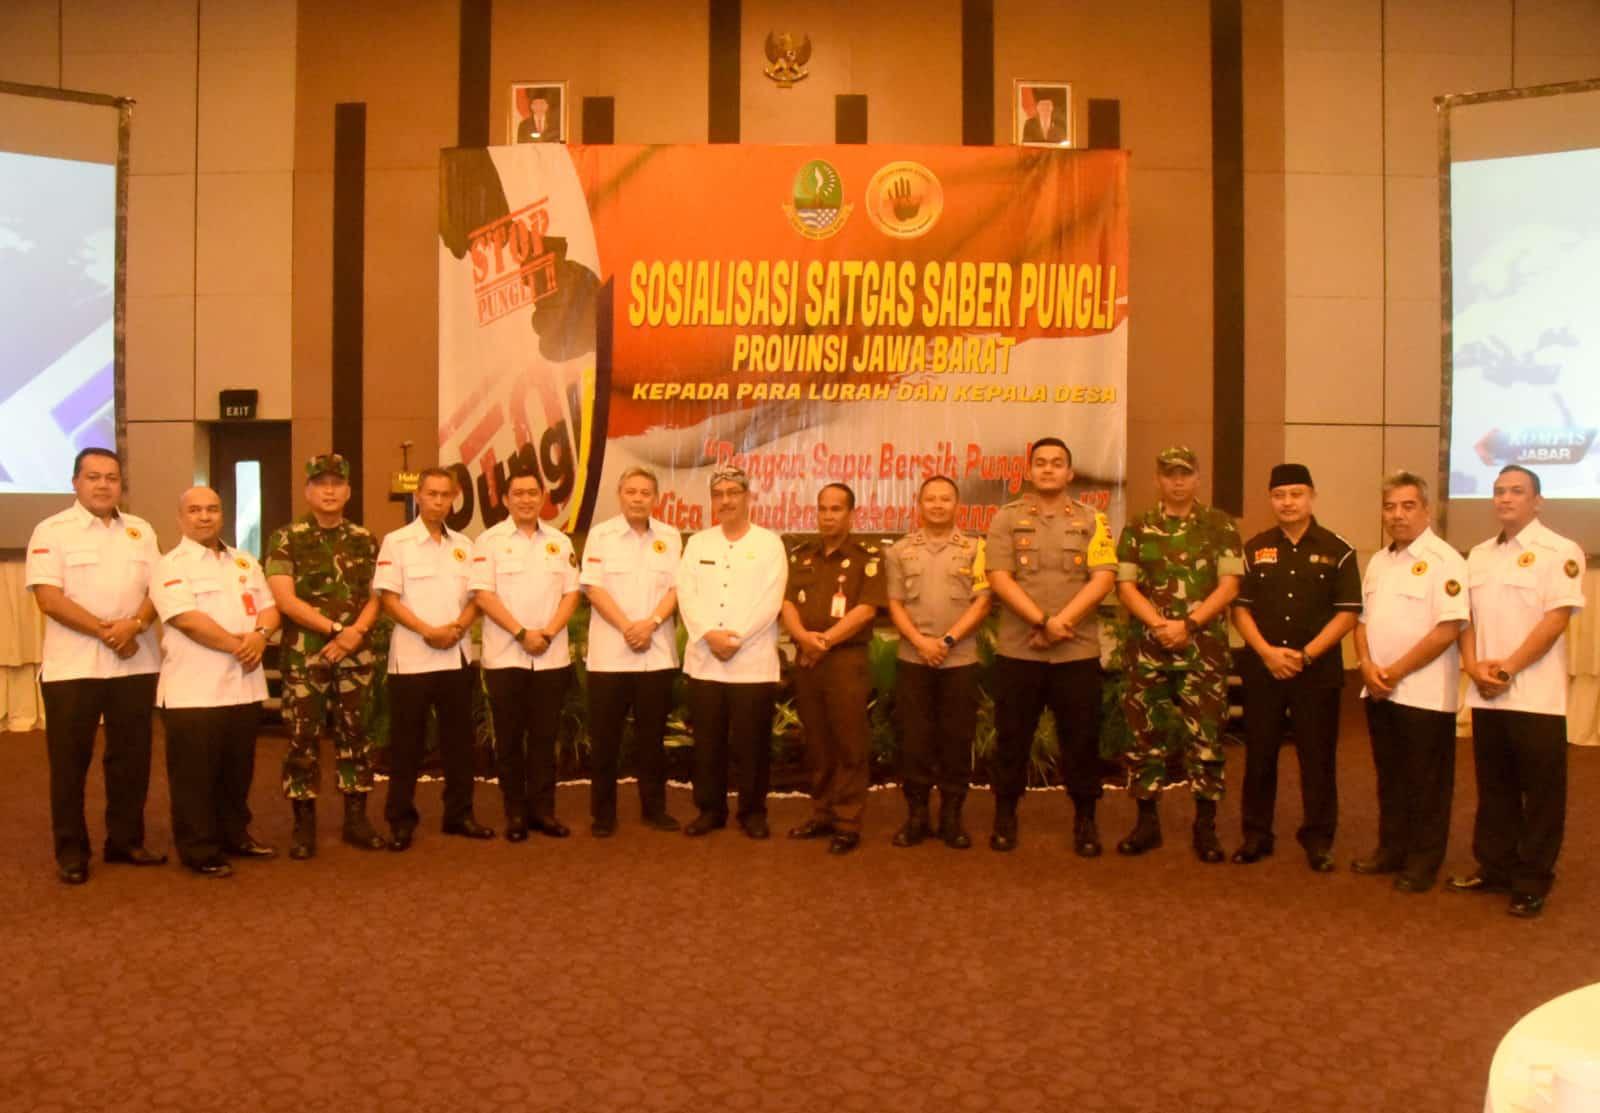 Danlanud Wiriadinata Menghadiri Pembukaan Sosialisasi Saber Pungli Tingkat Provinsi Jawa Barat